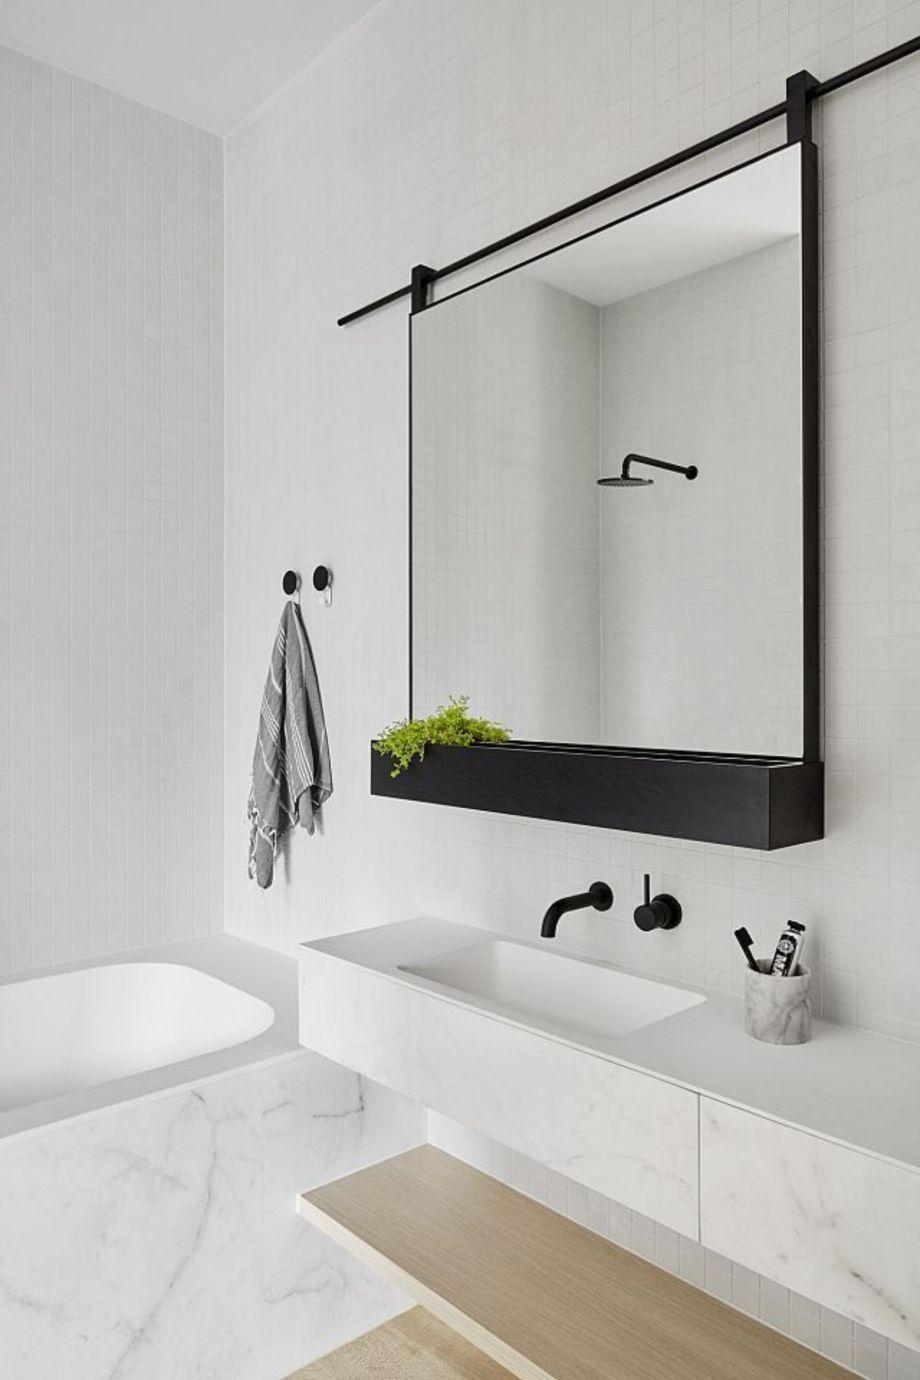 Bathroom Mirror Ideas (DIY) For A Small Bathroom | Cottage bathroom ...